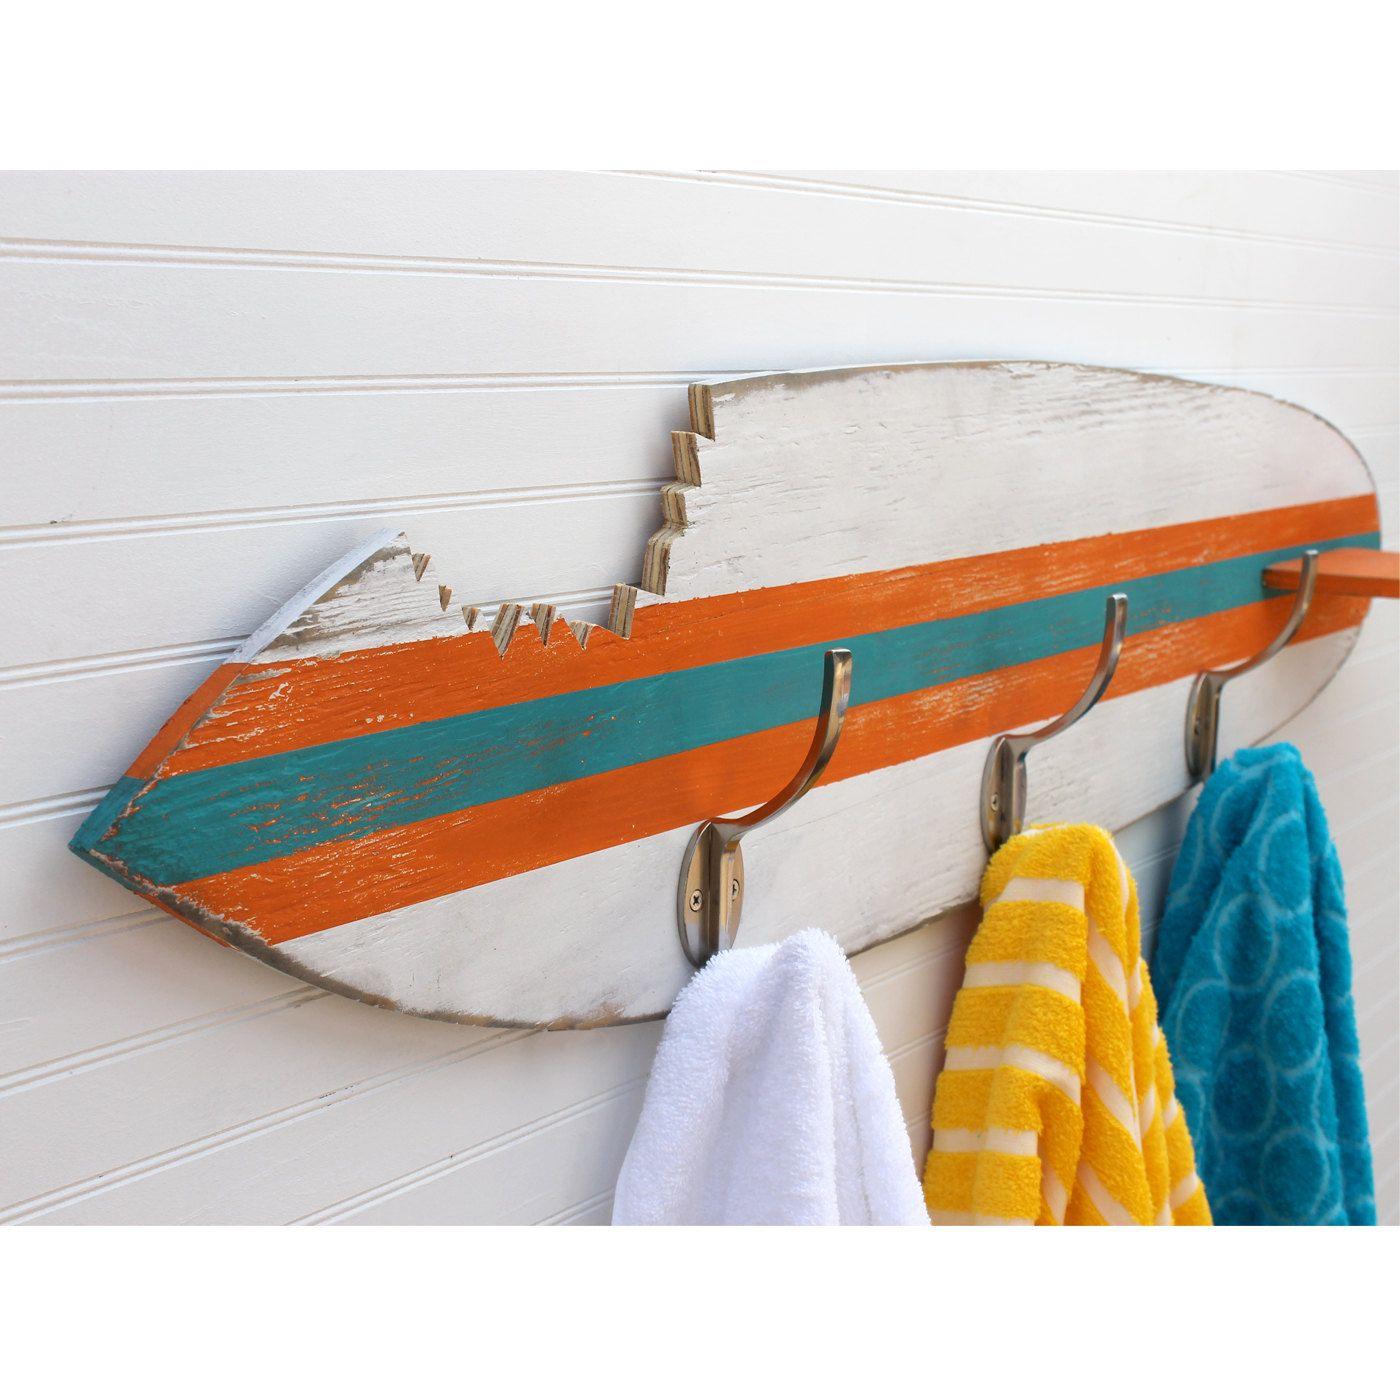 Surfboard Towel Hook Shark Bite Wooden Surfboard Towel Rack Beach ...